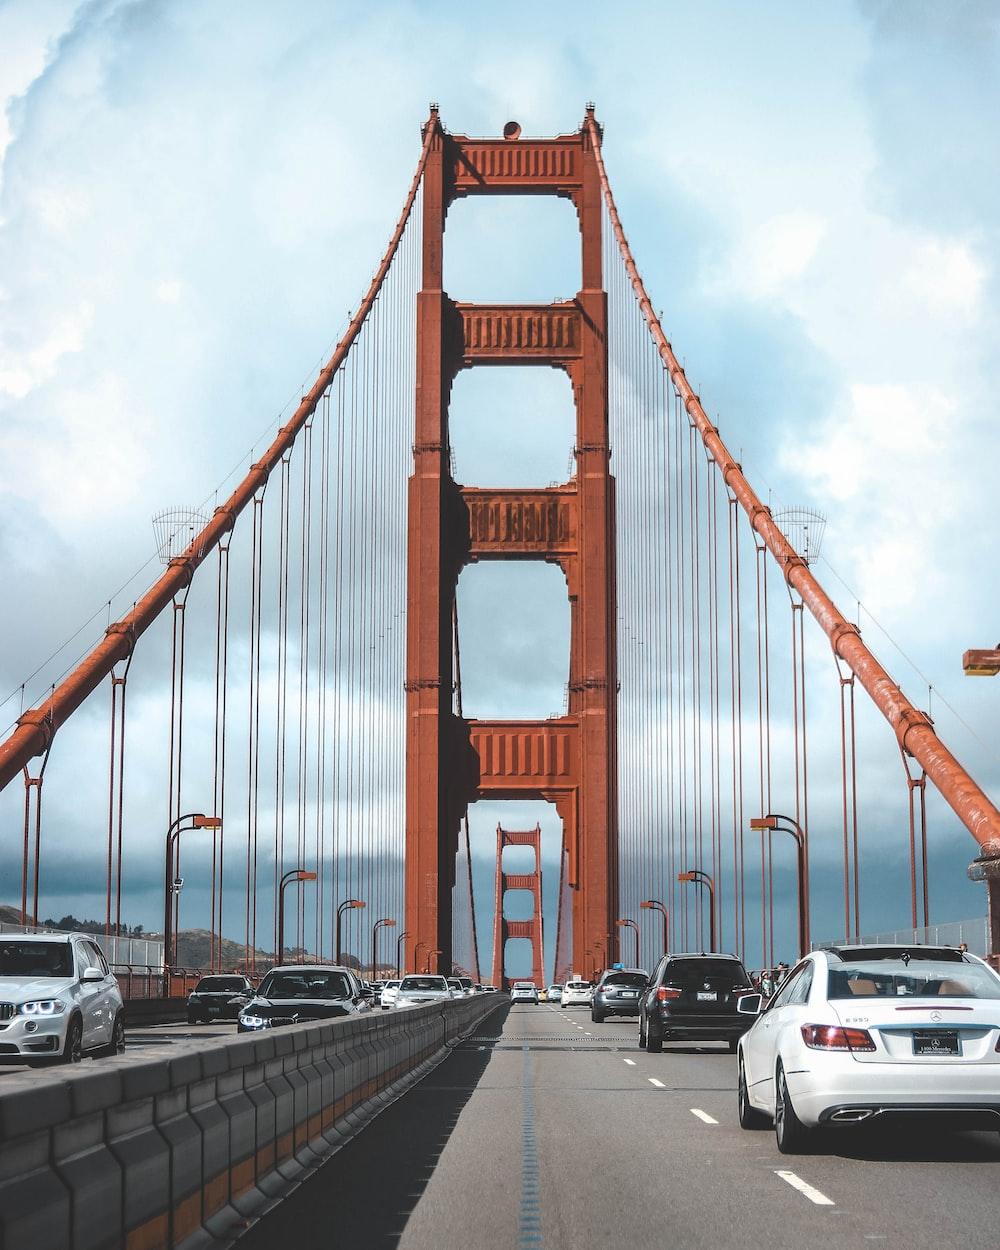 cars crossing in the bridge